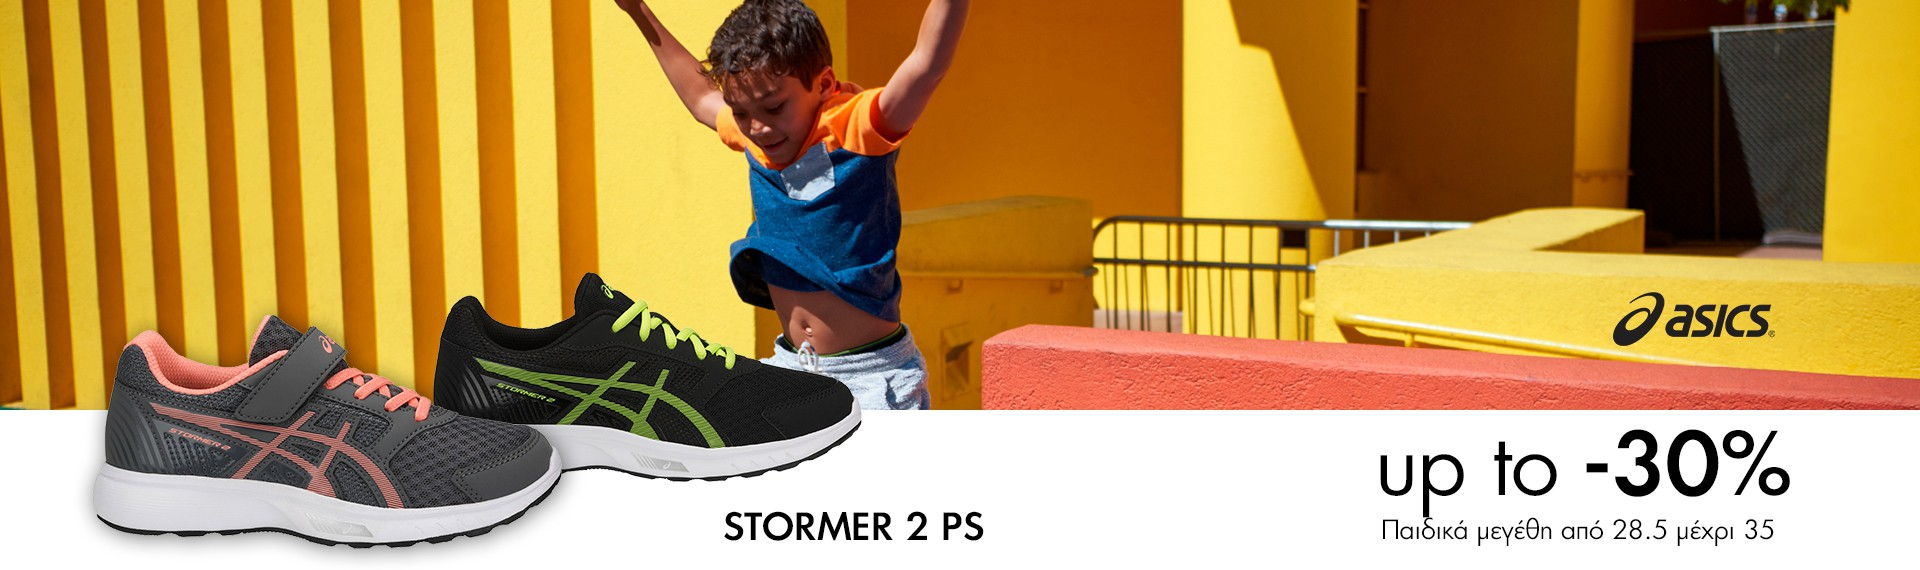 Stormer children up to 30%